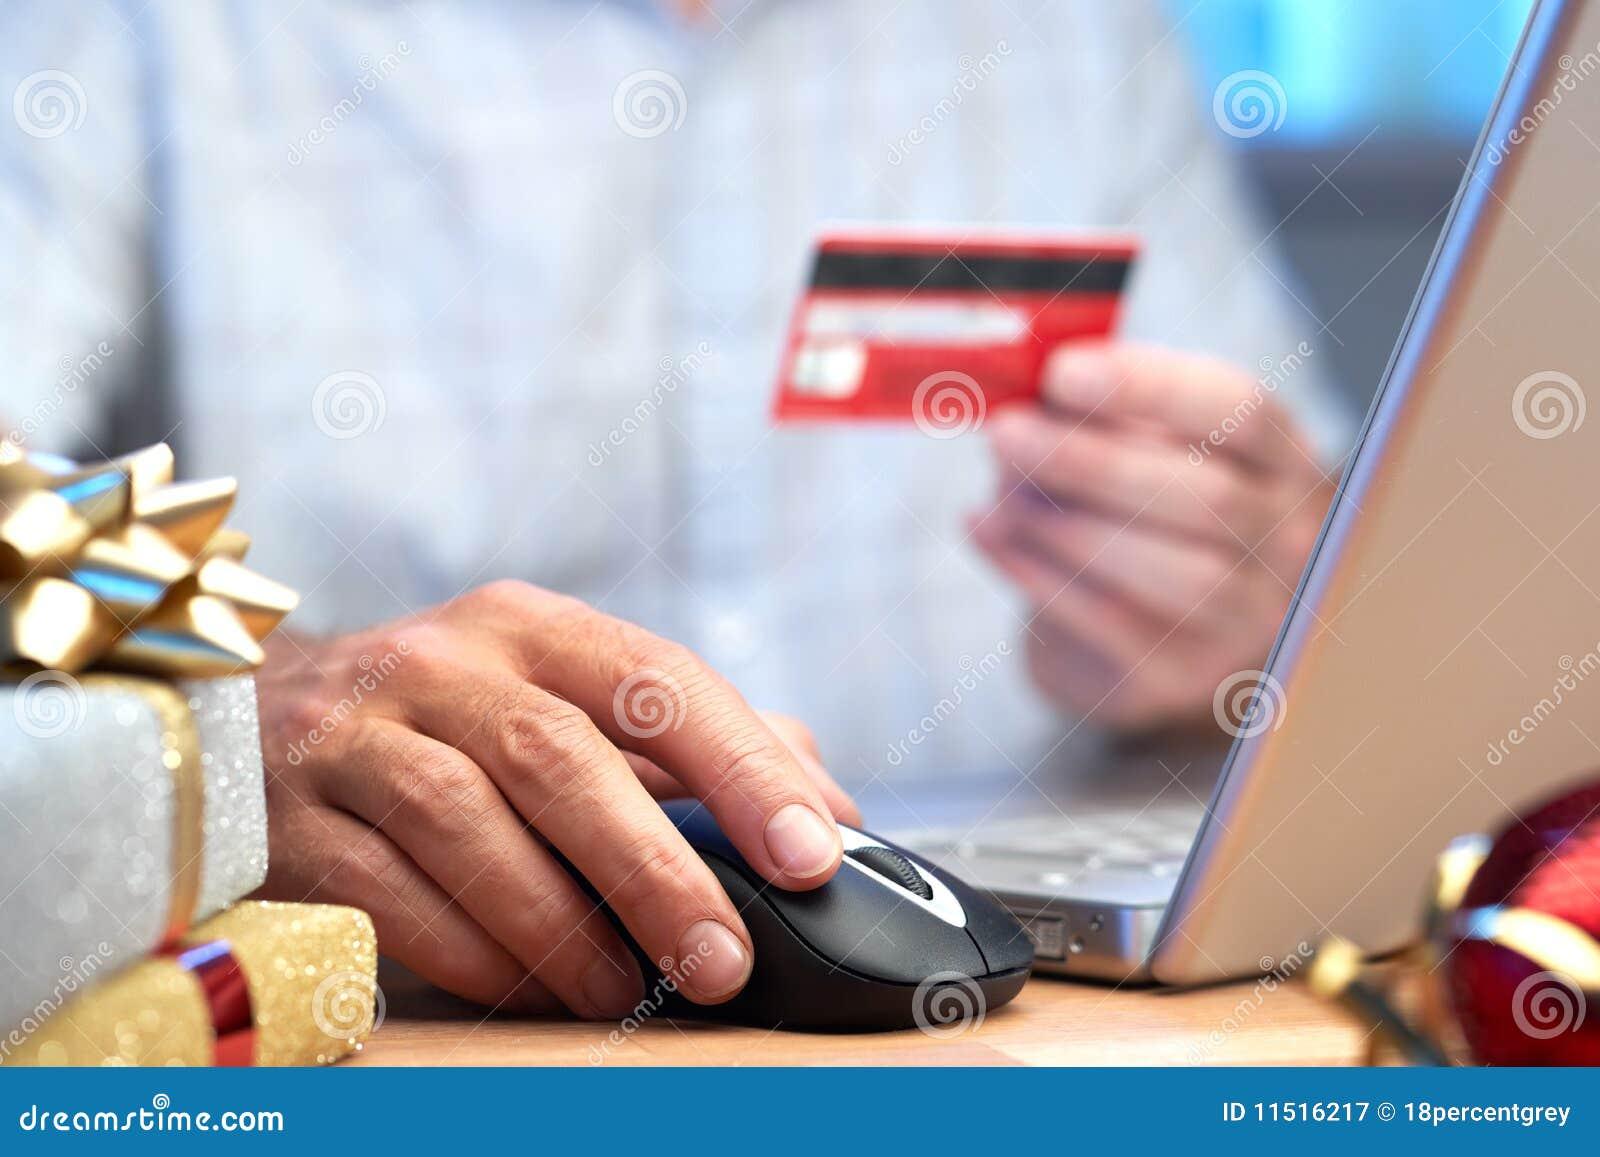 Online internet Christmas shopping concept